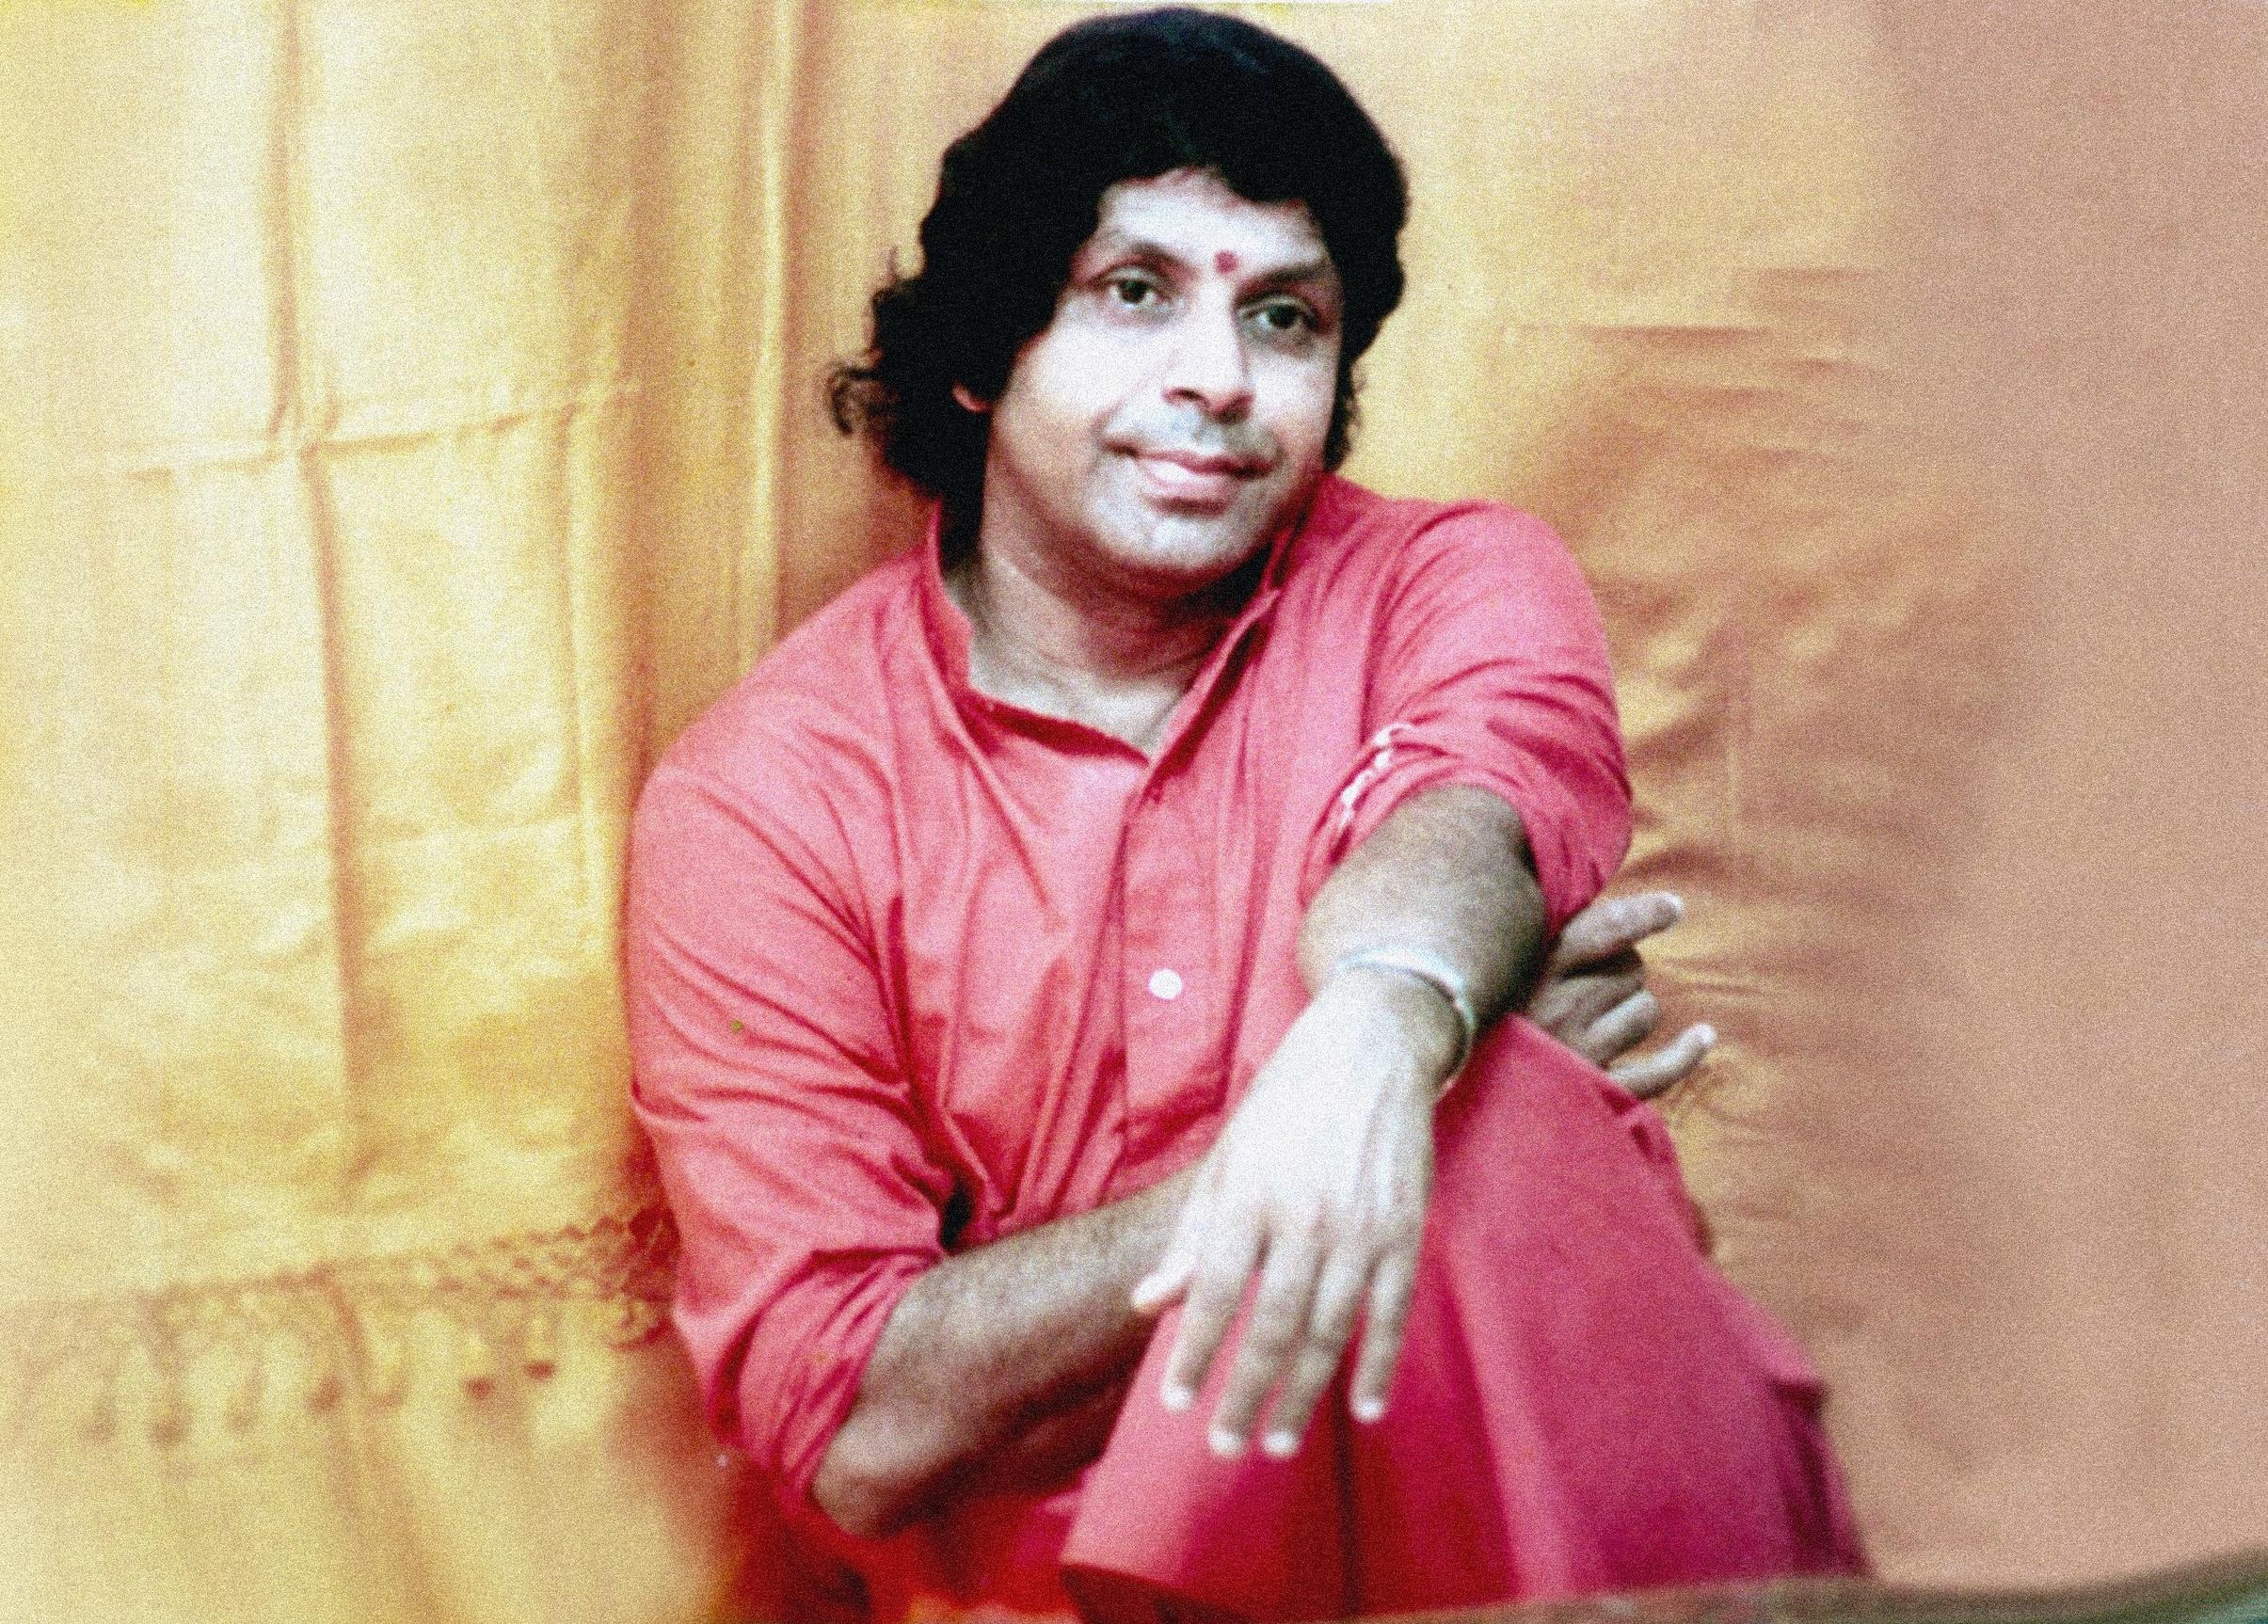 Swami Shantanand Sarawati |Our founder, guiding light and inspiration.